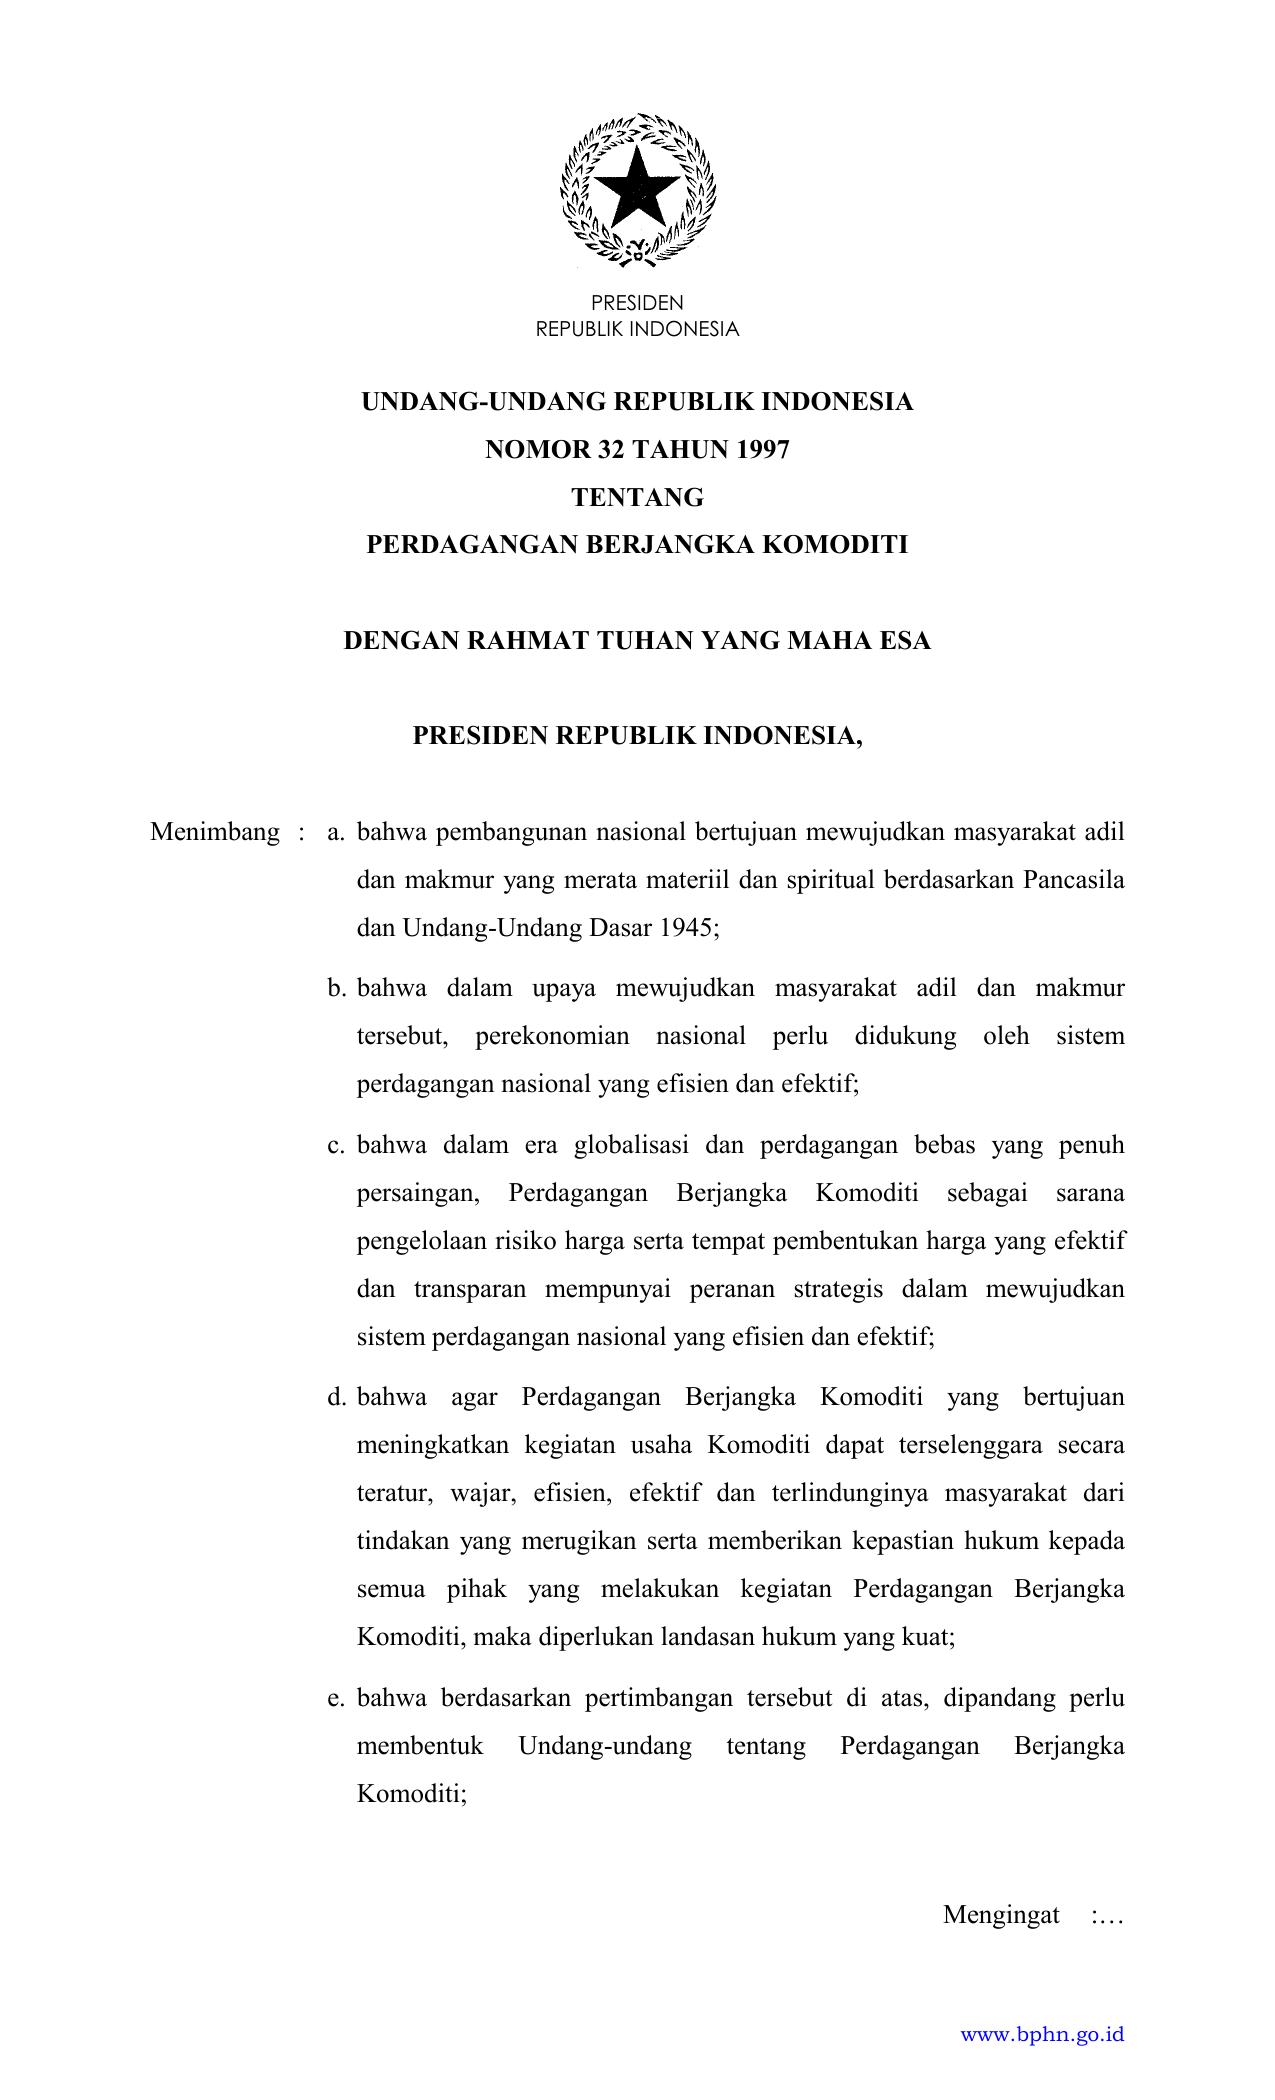 Bursa berjangka - Wikipedia bahasa Indonesia, ensiklopedia bebas